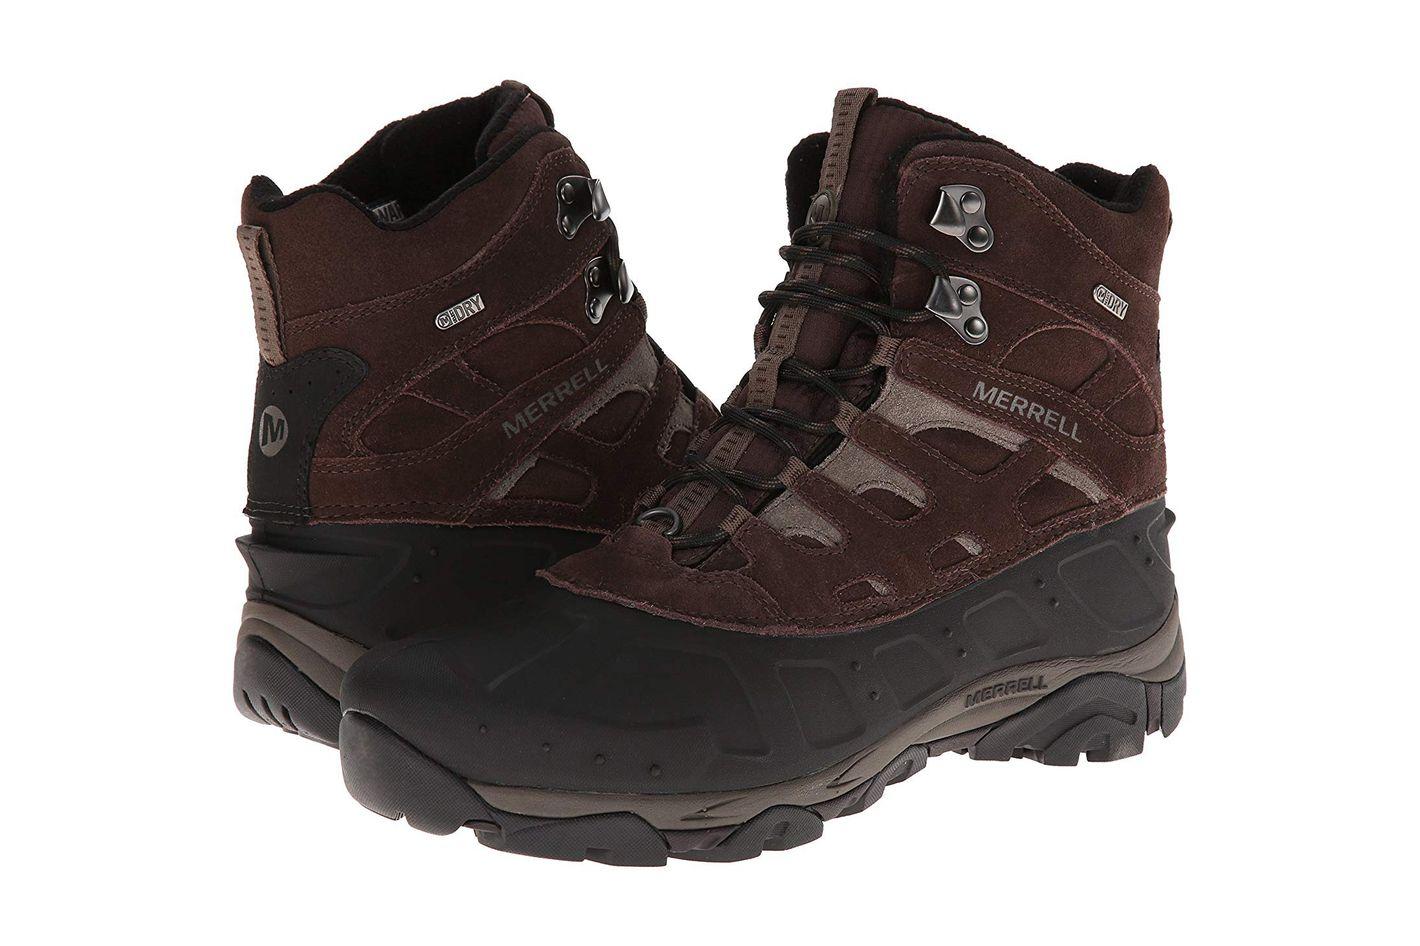 Merrell Men's Moab Polar Waterproof Winter Boot